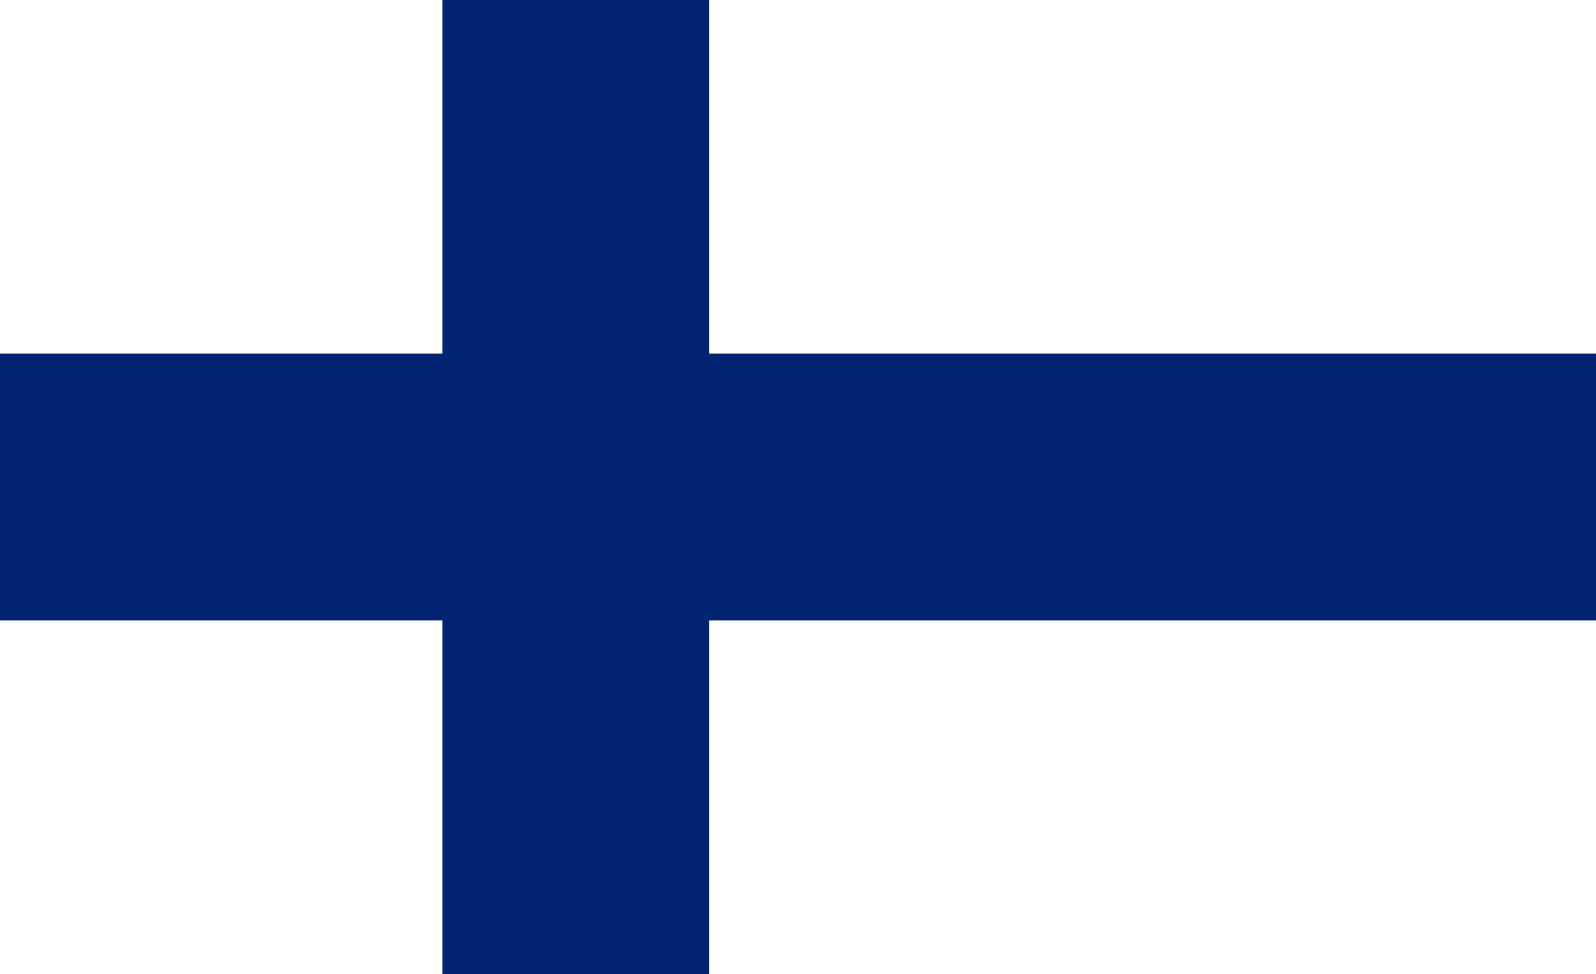 flag finlanf